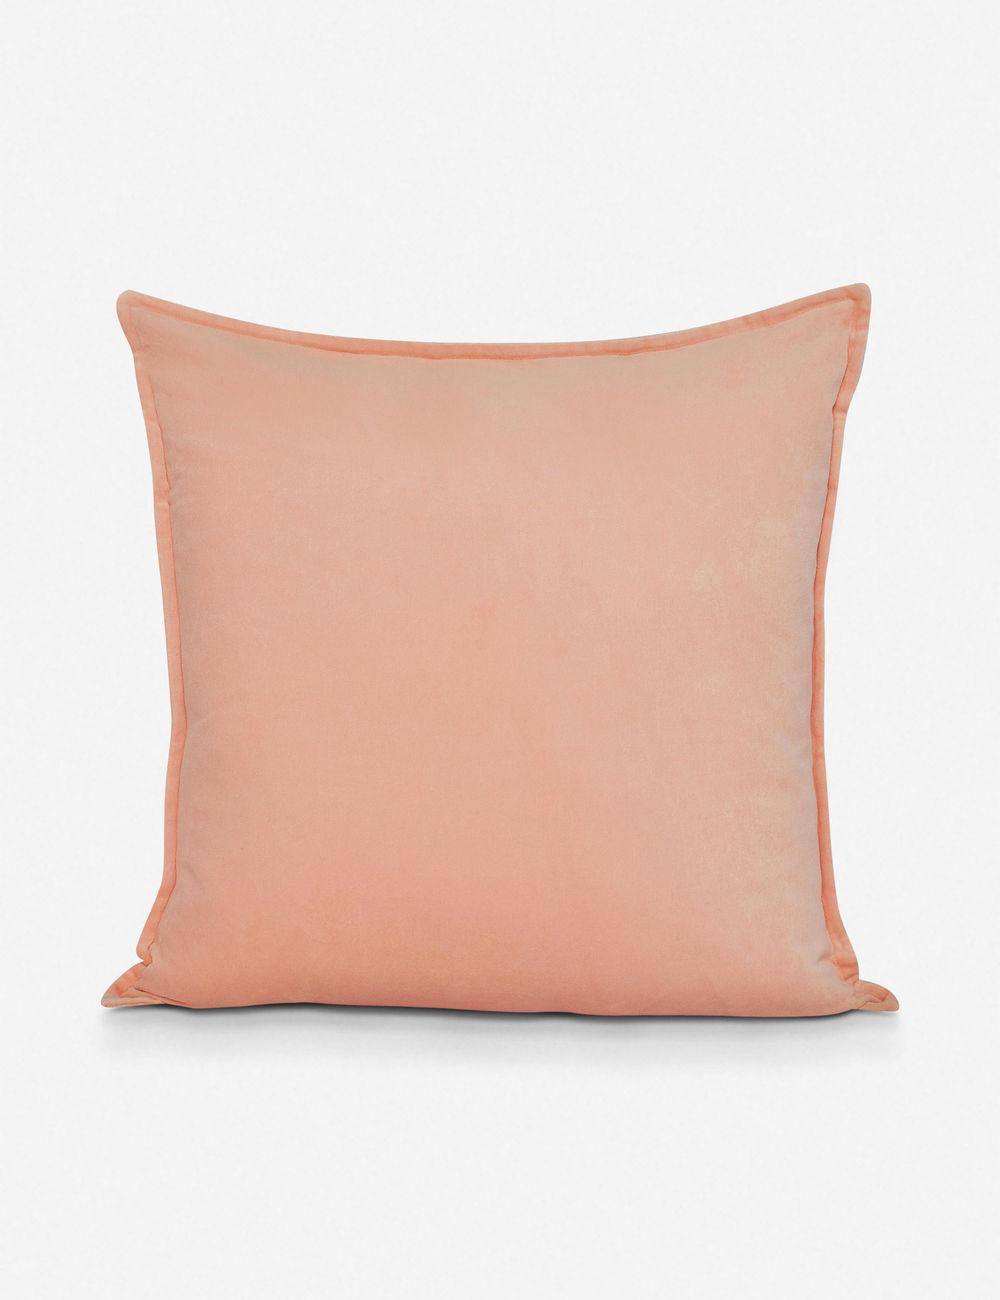 Maxen Velvet Pillow